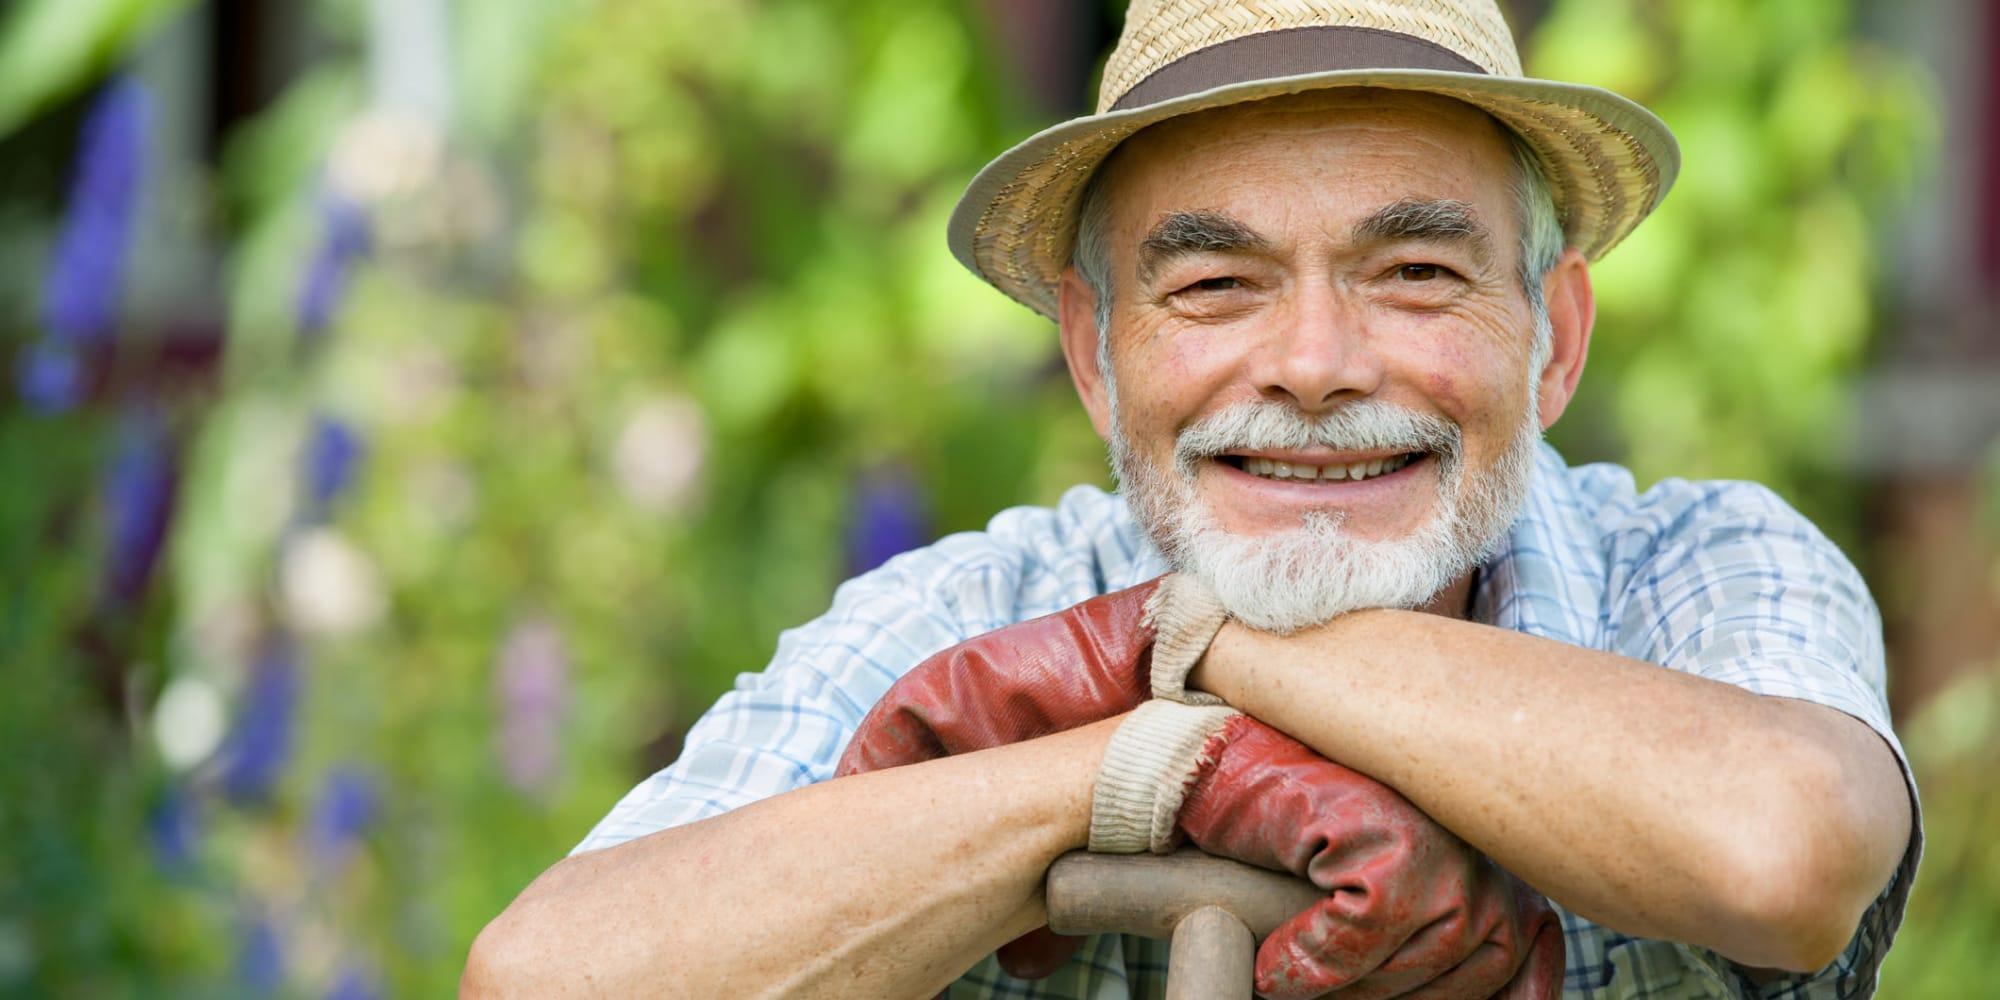 Palo Alto Commons offers senior living options in Palo Alto, California